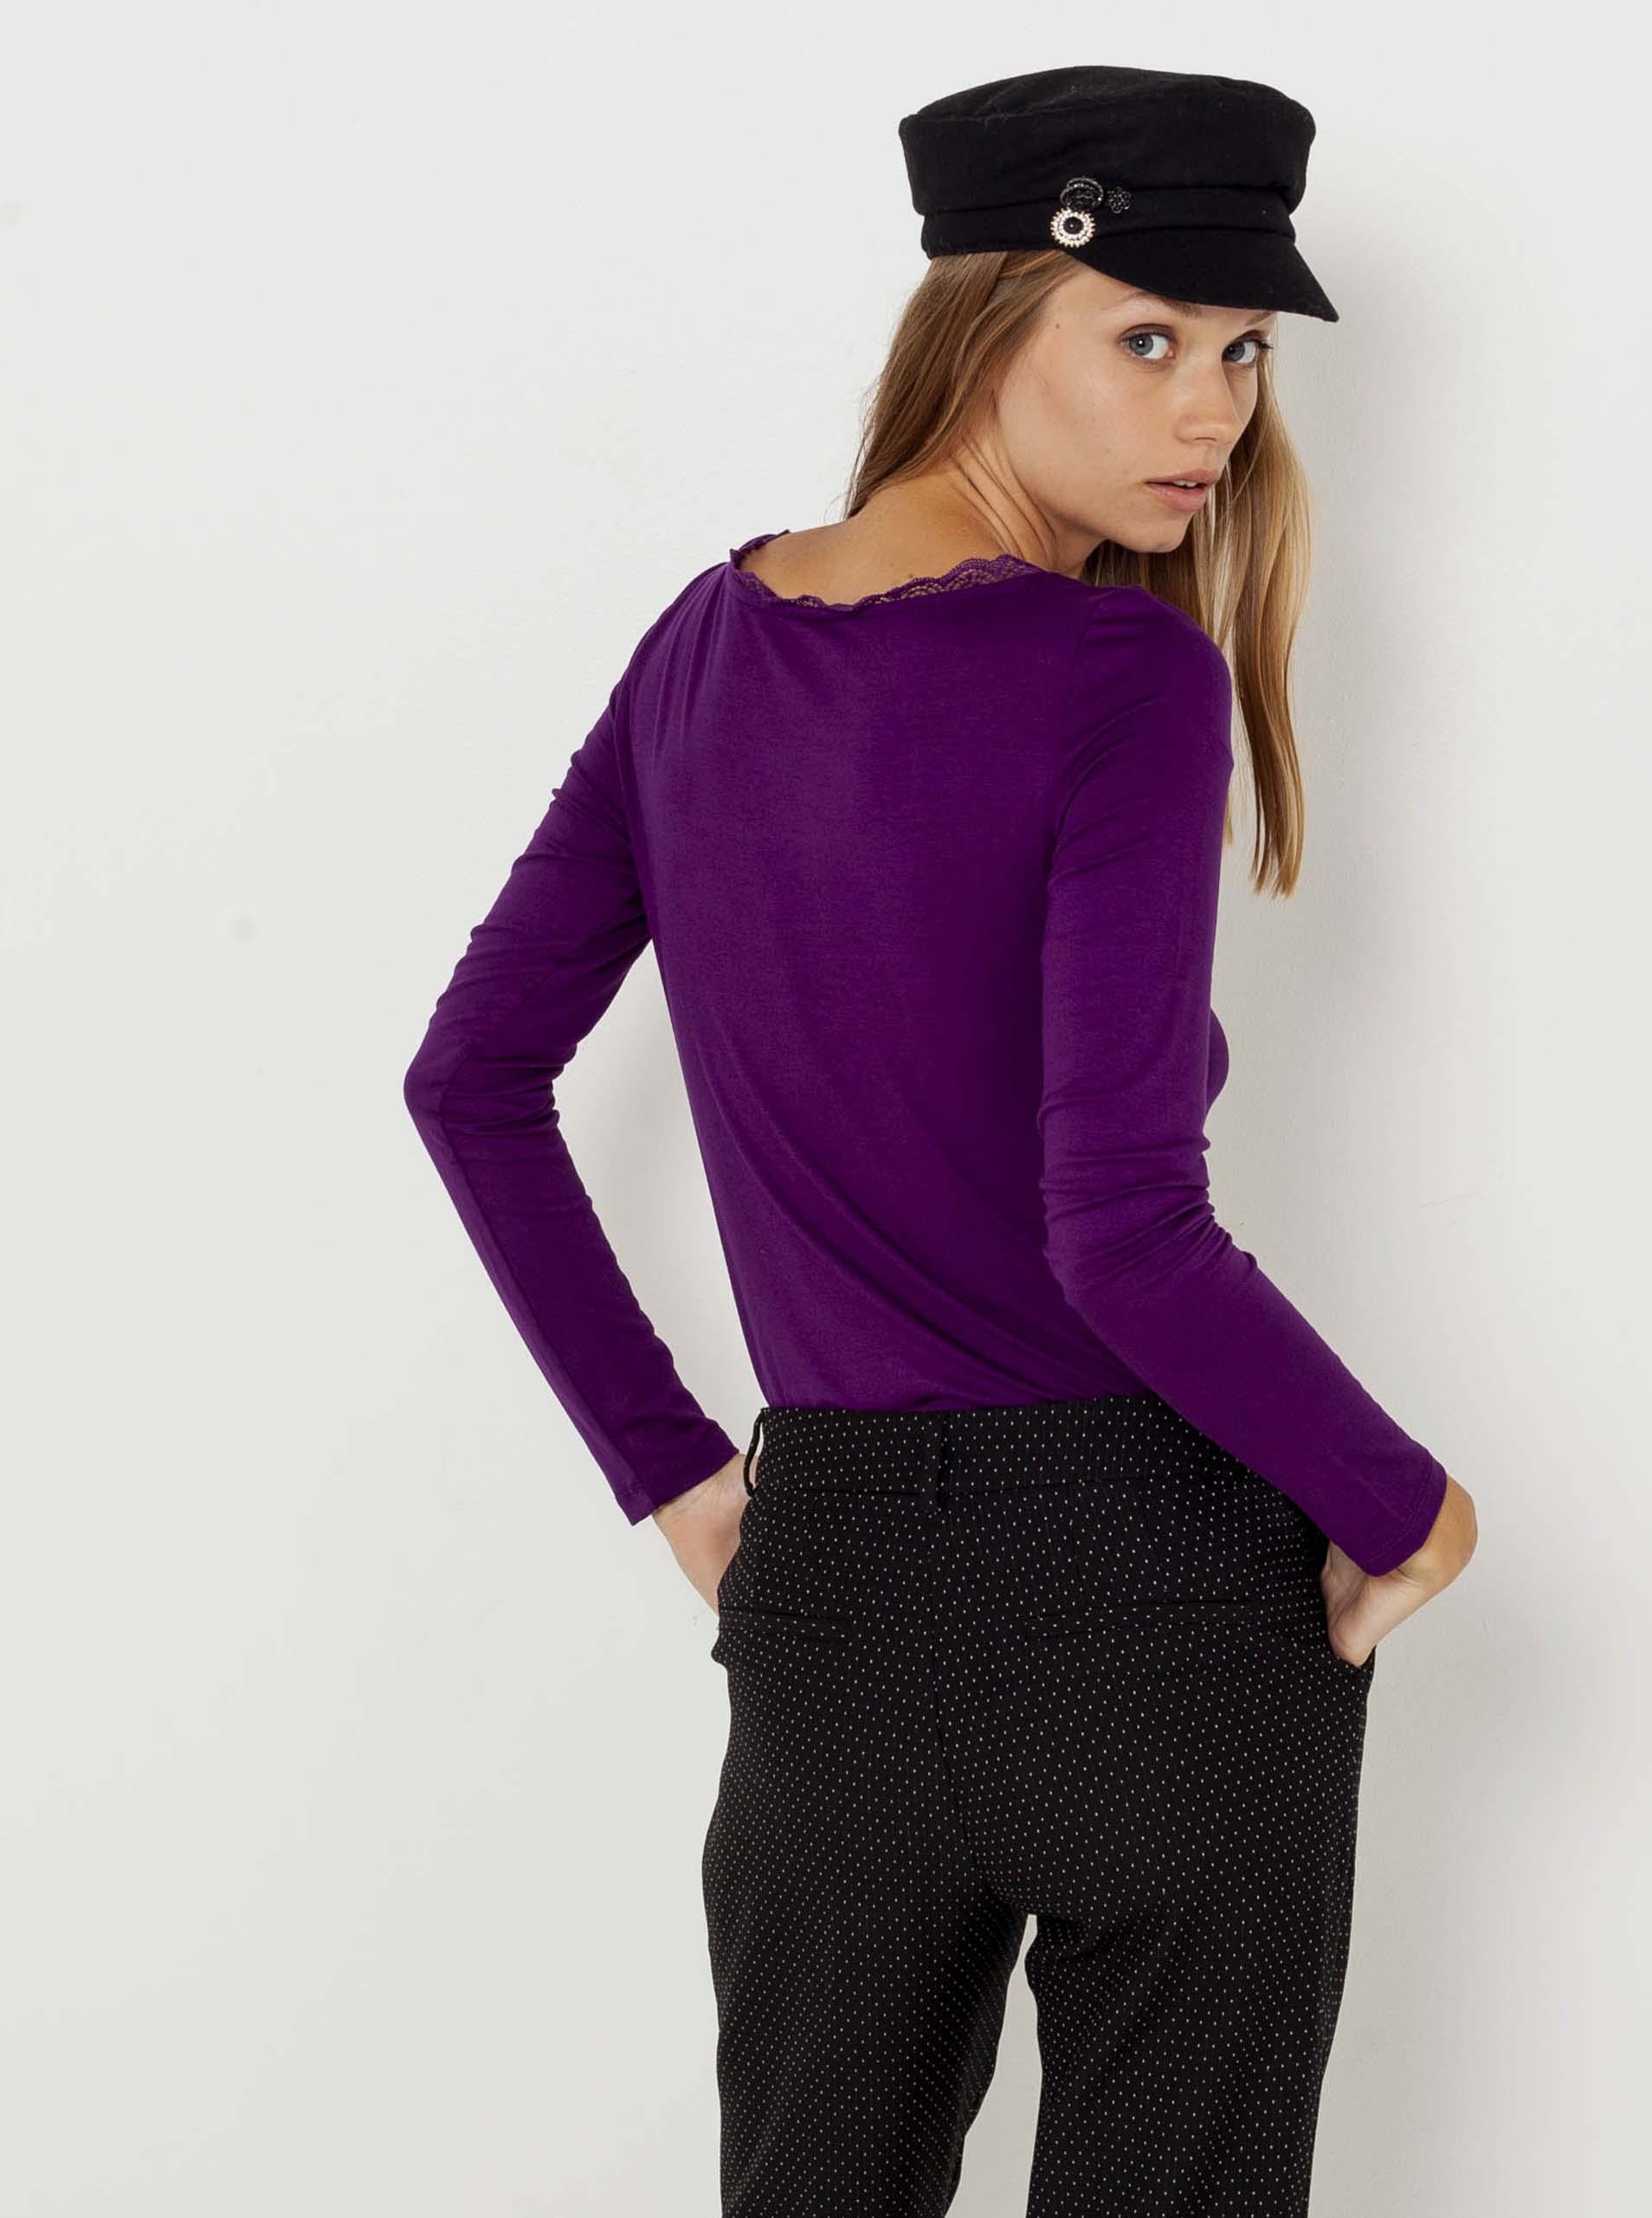 CAMAIEU Women's t-shirt violet